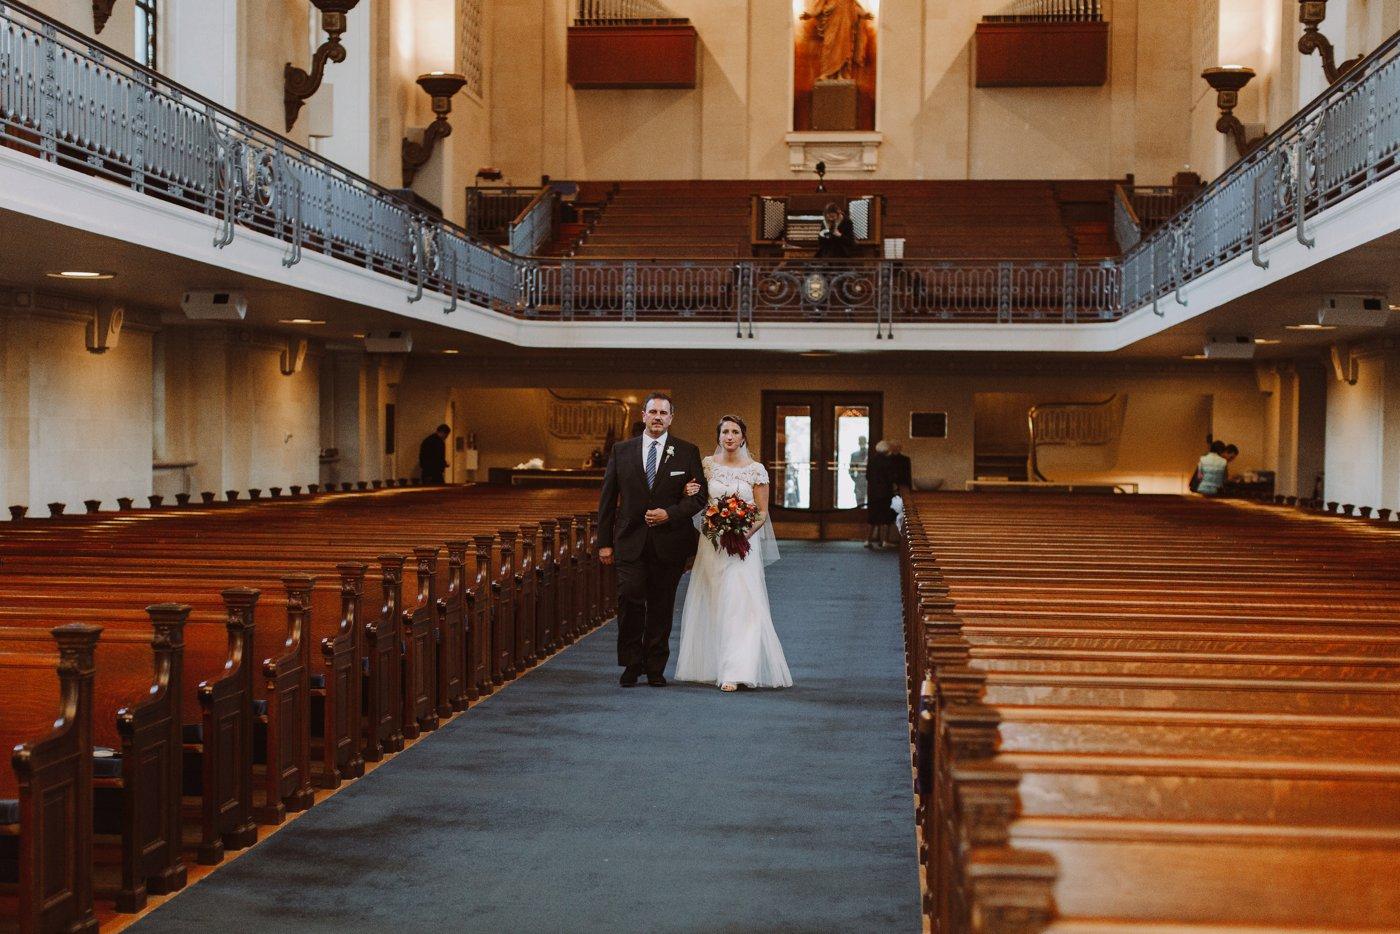 USNA chapel wedding Downtown Annapolis Maryland Annapolis wedding photographer